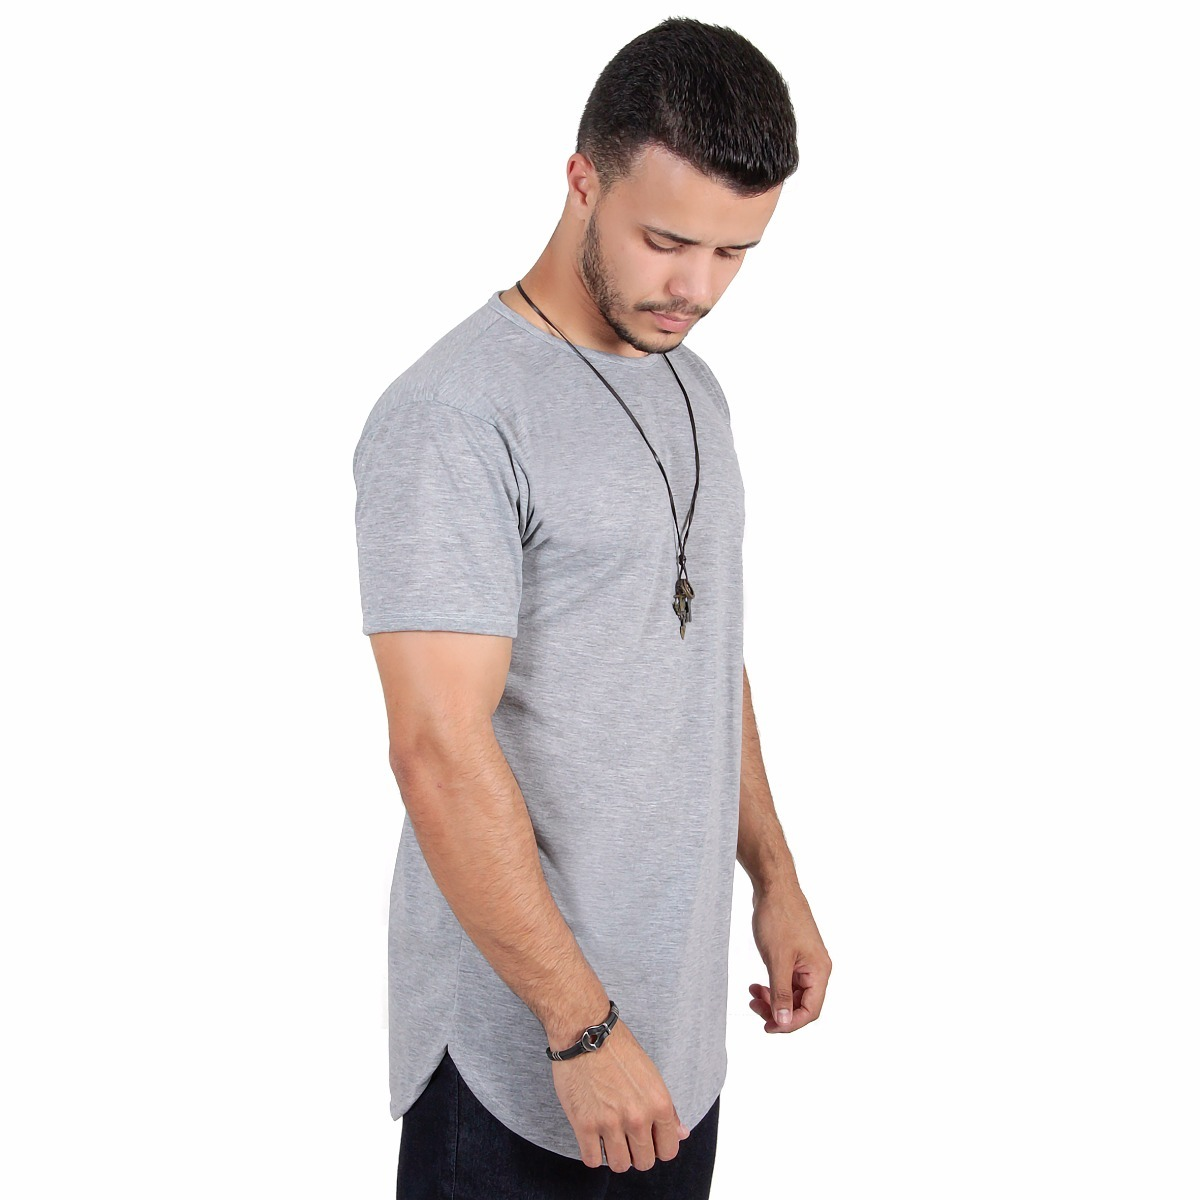 272c7a197 camiseta camisa blusa oversized longline masculina swag. Carregando zoom.